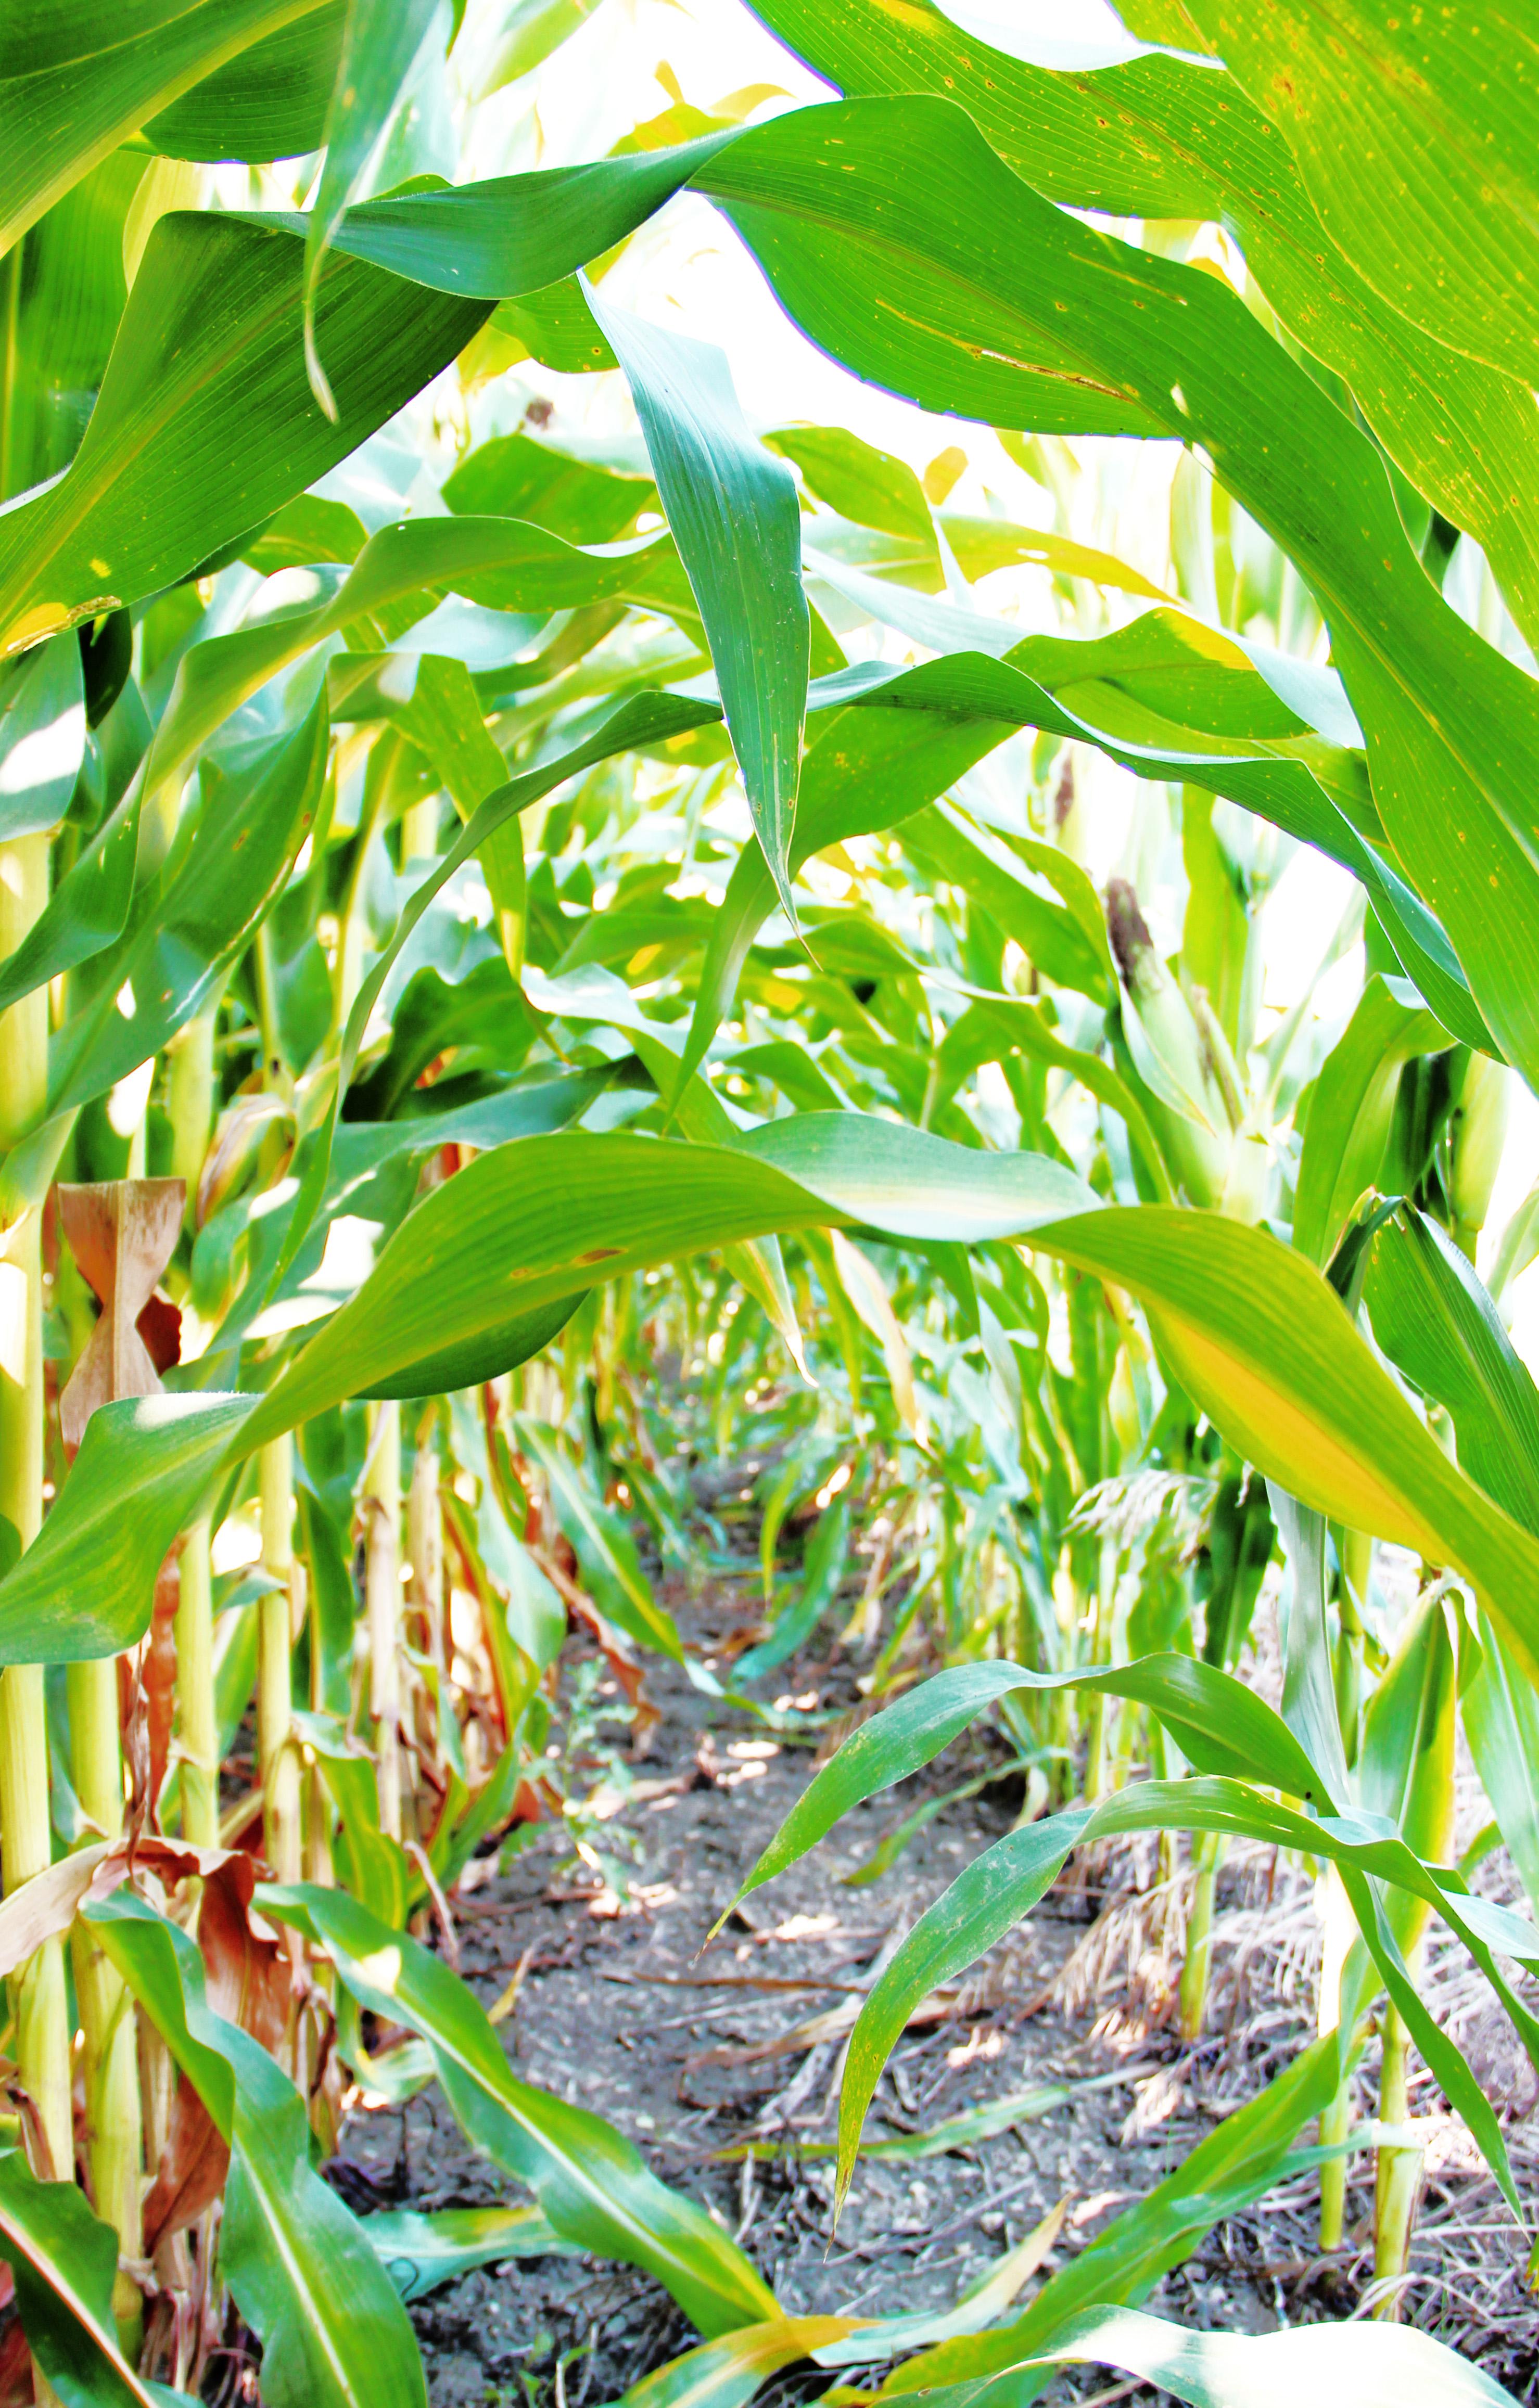 corn rows amongst them